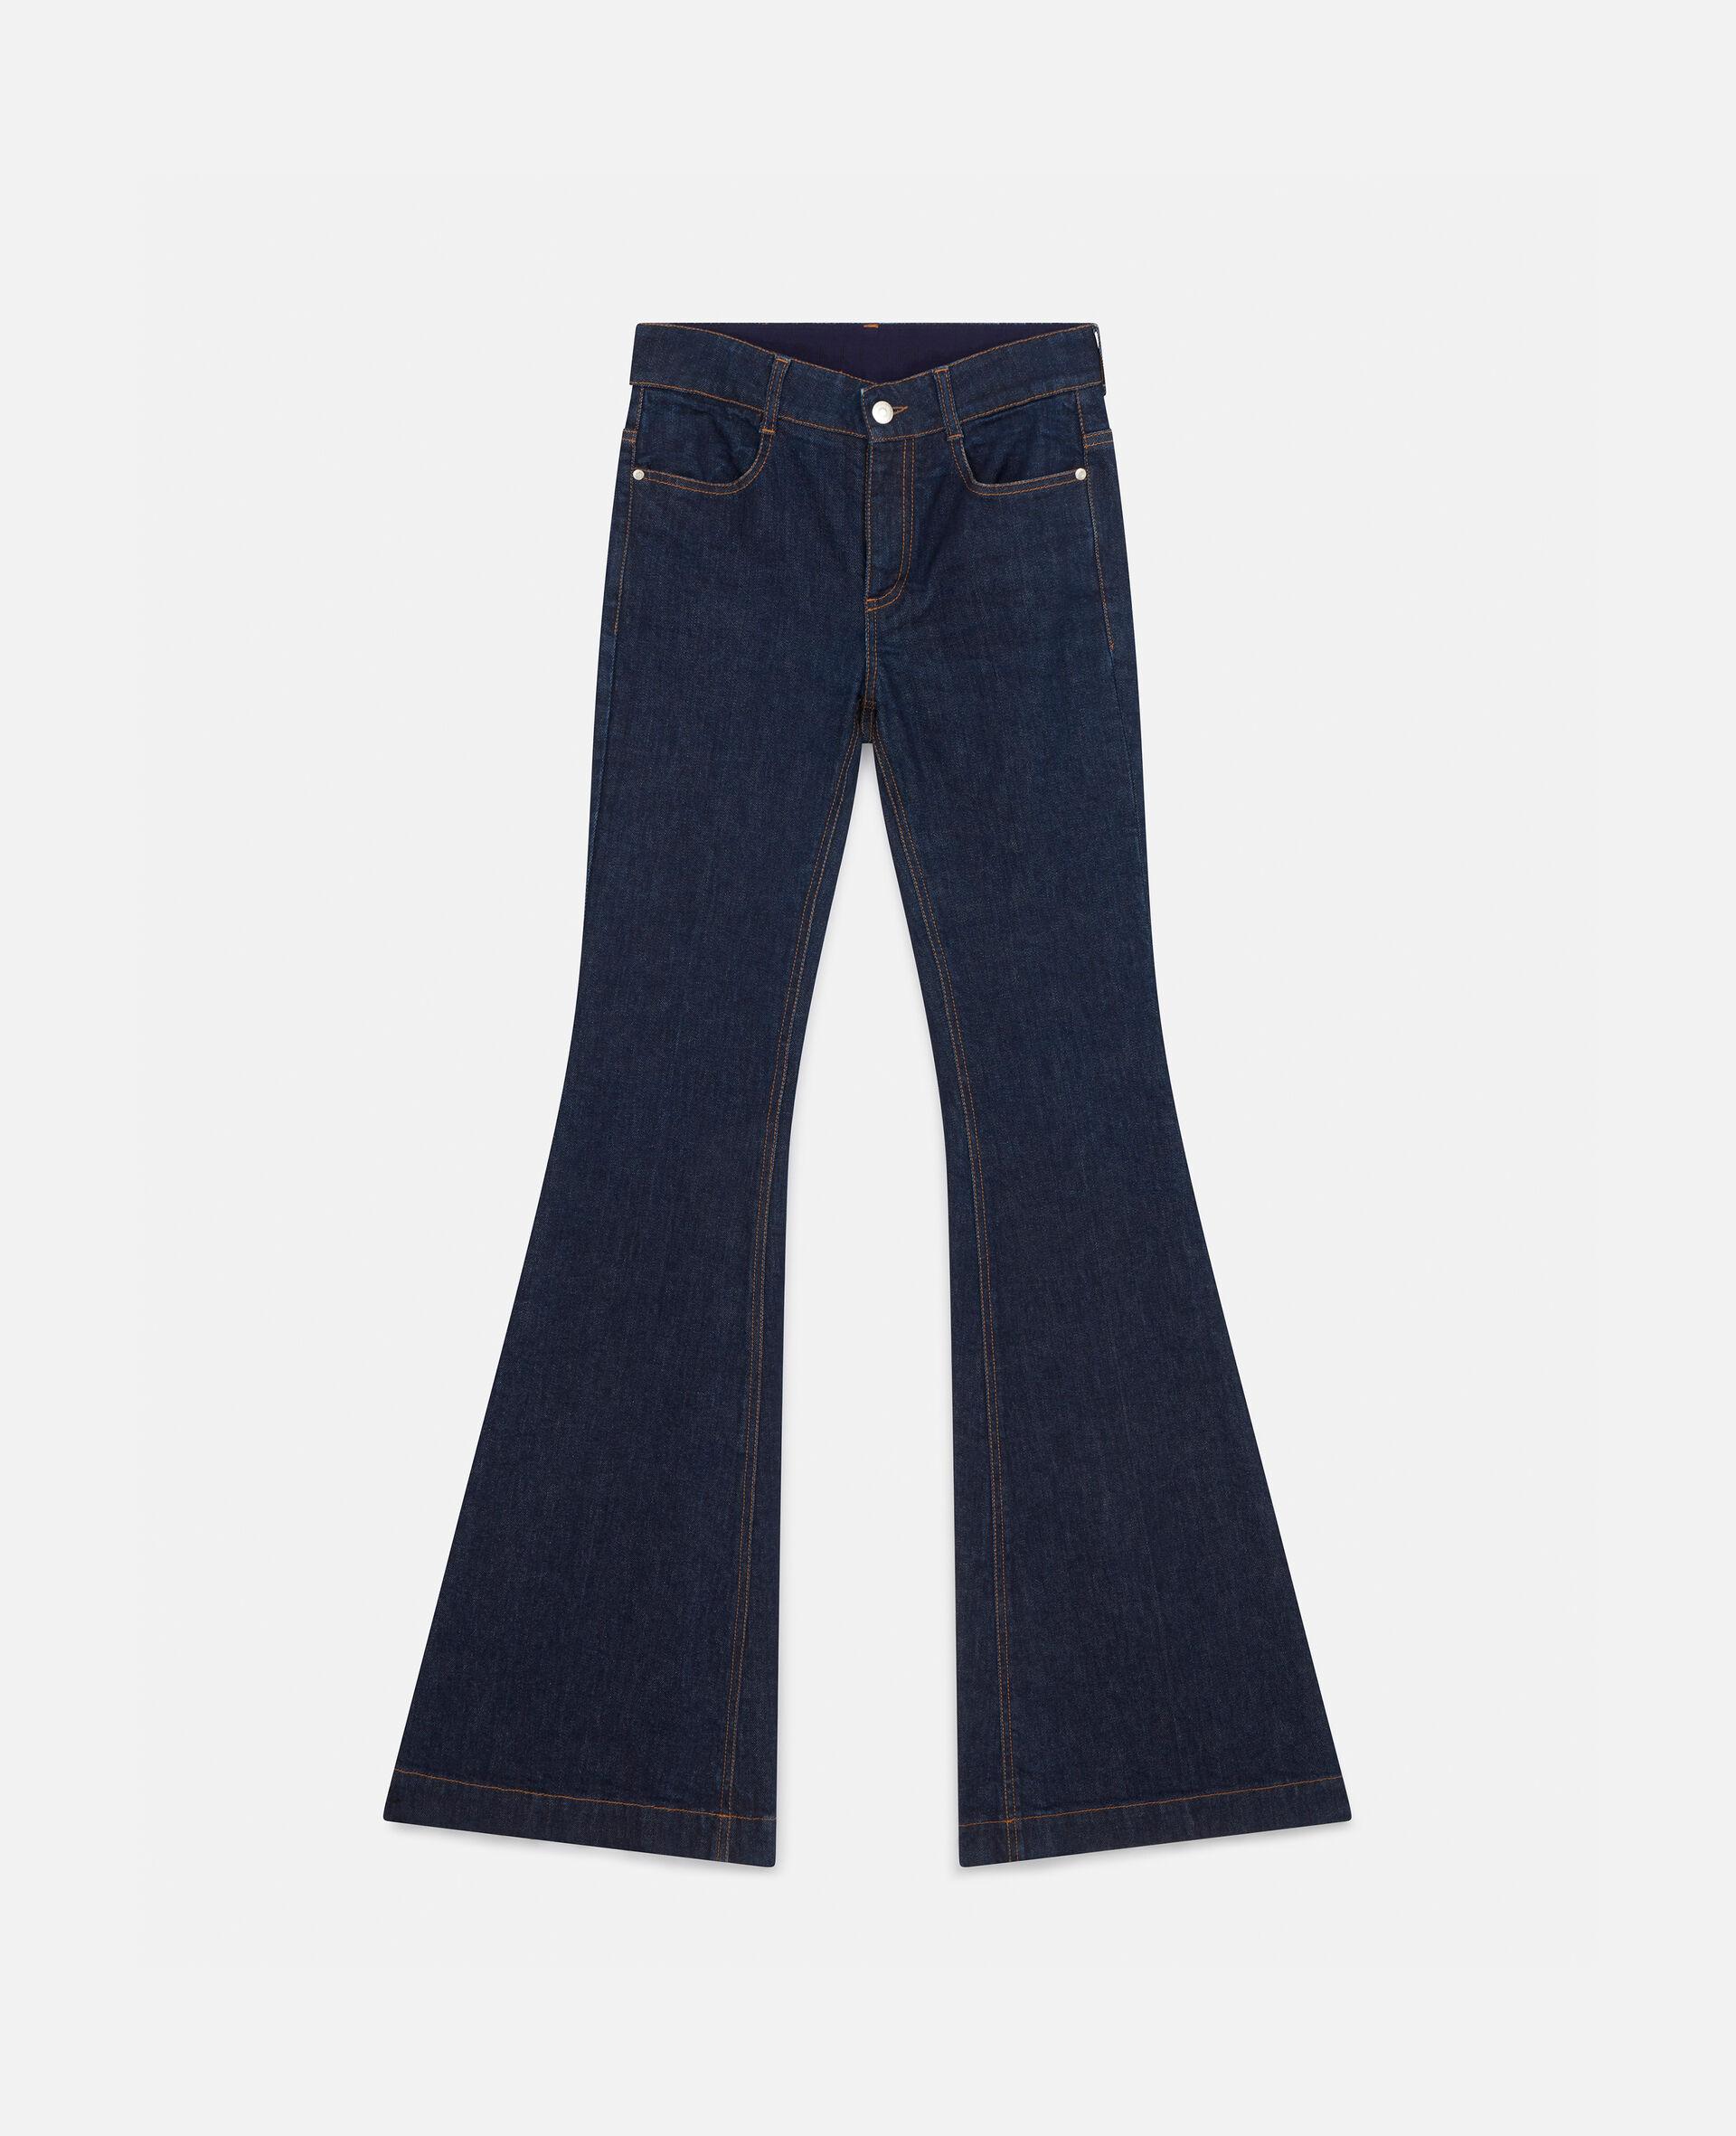 70 年代喇叭牛仔长裤-蓝色-large image number 0